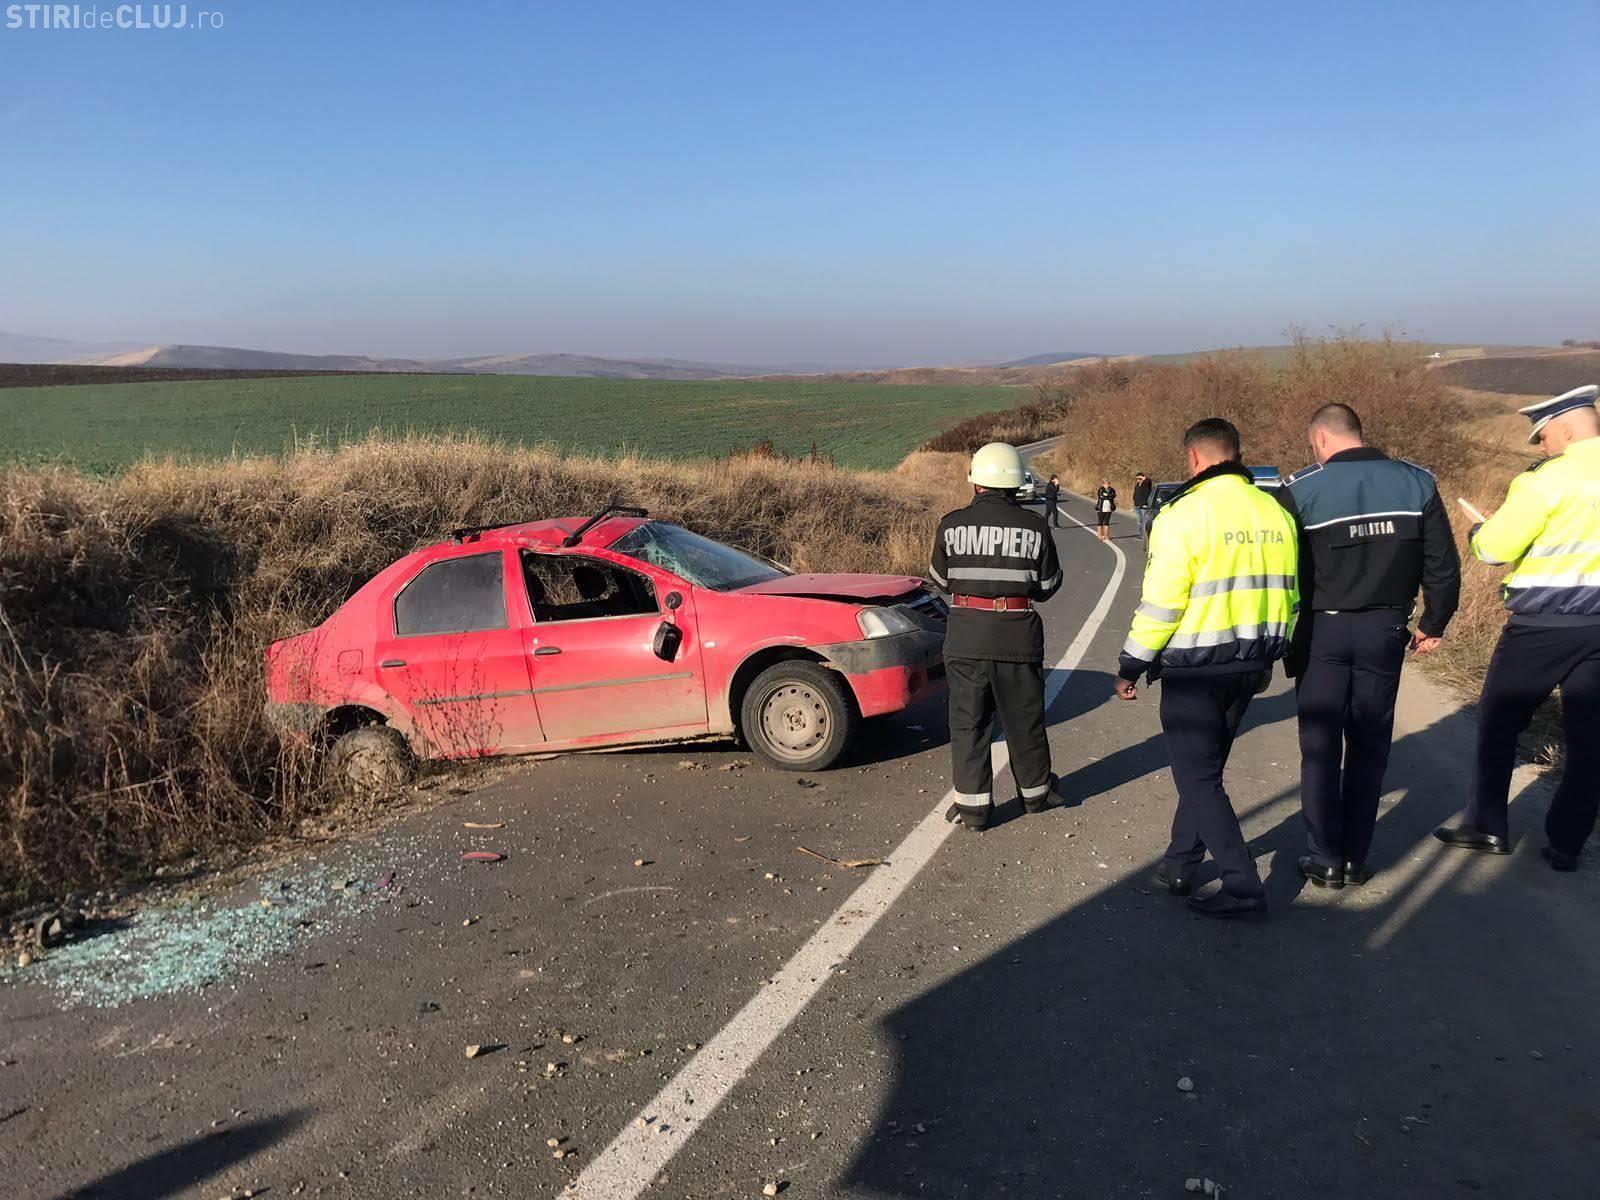 Accident mortal în Ploscoș. A intervenit elicopterul SMURD - FOTO / UPDATE